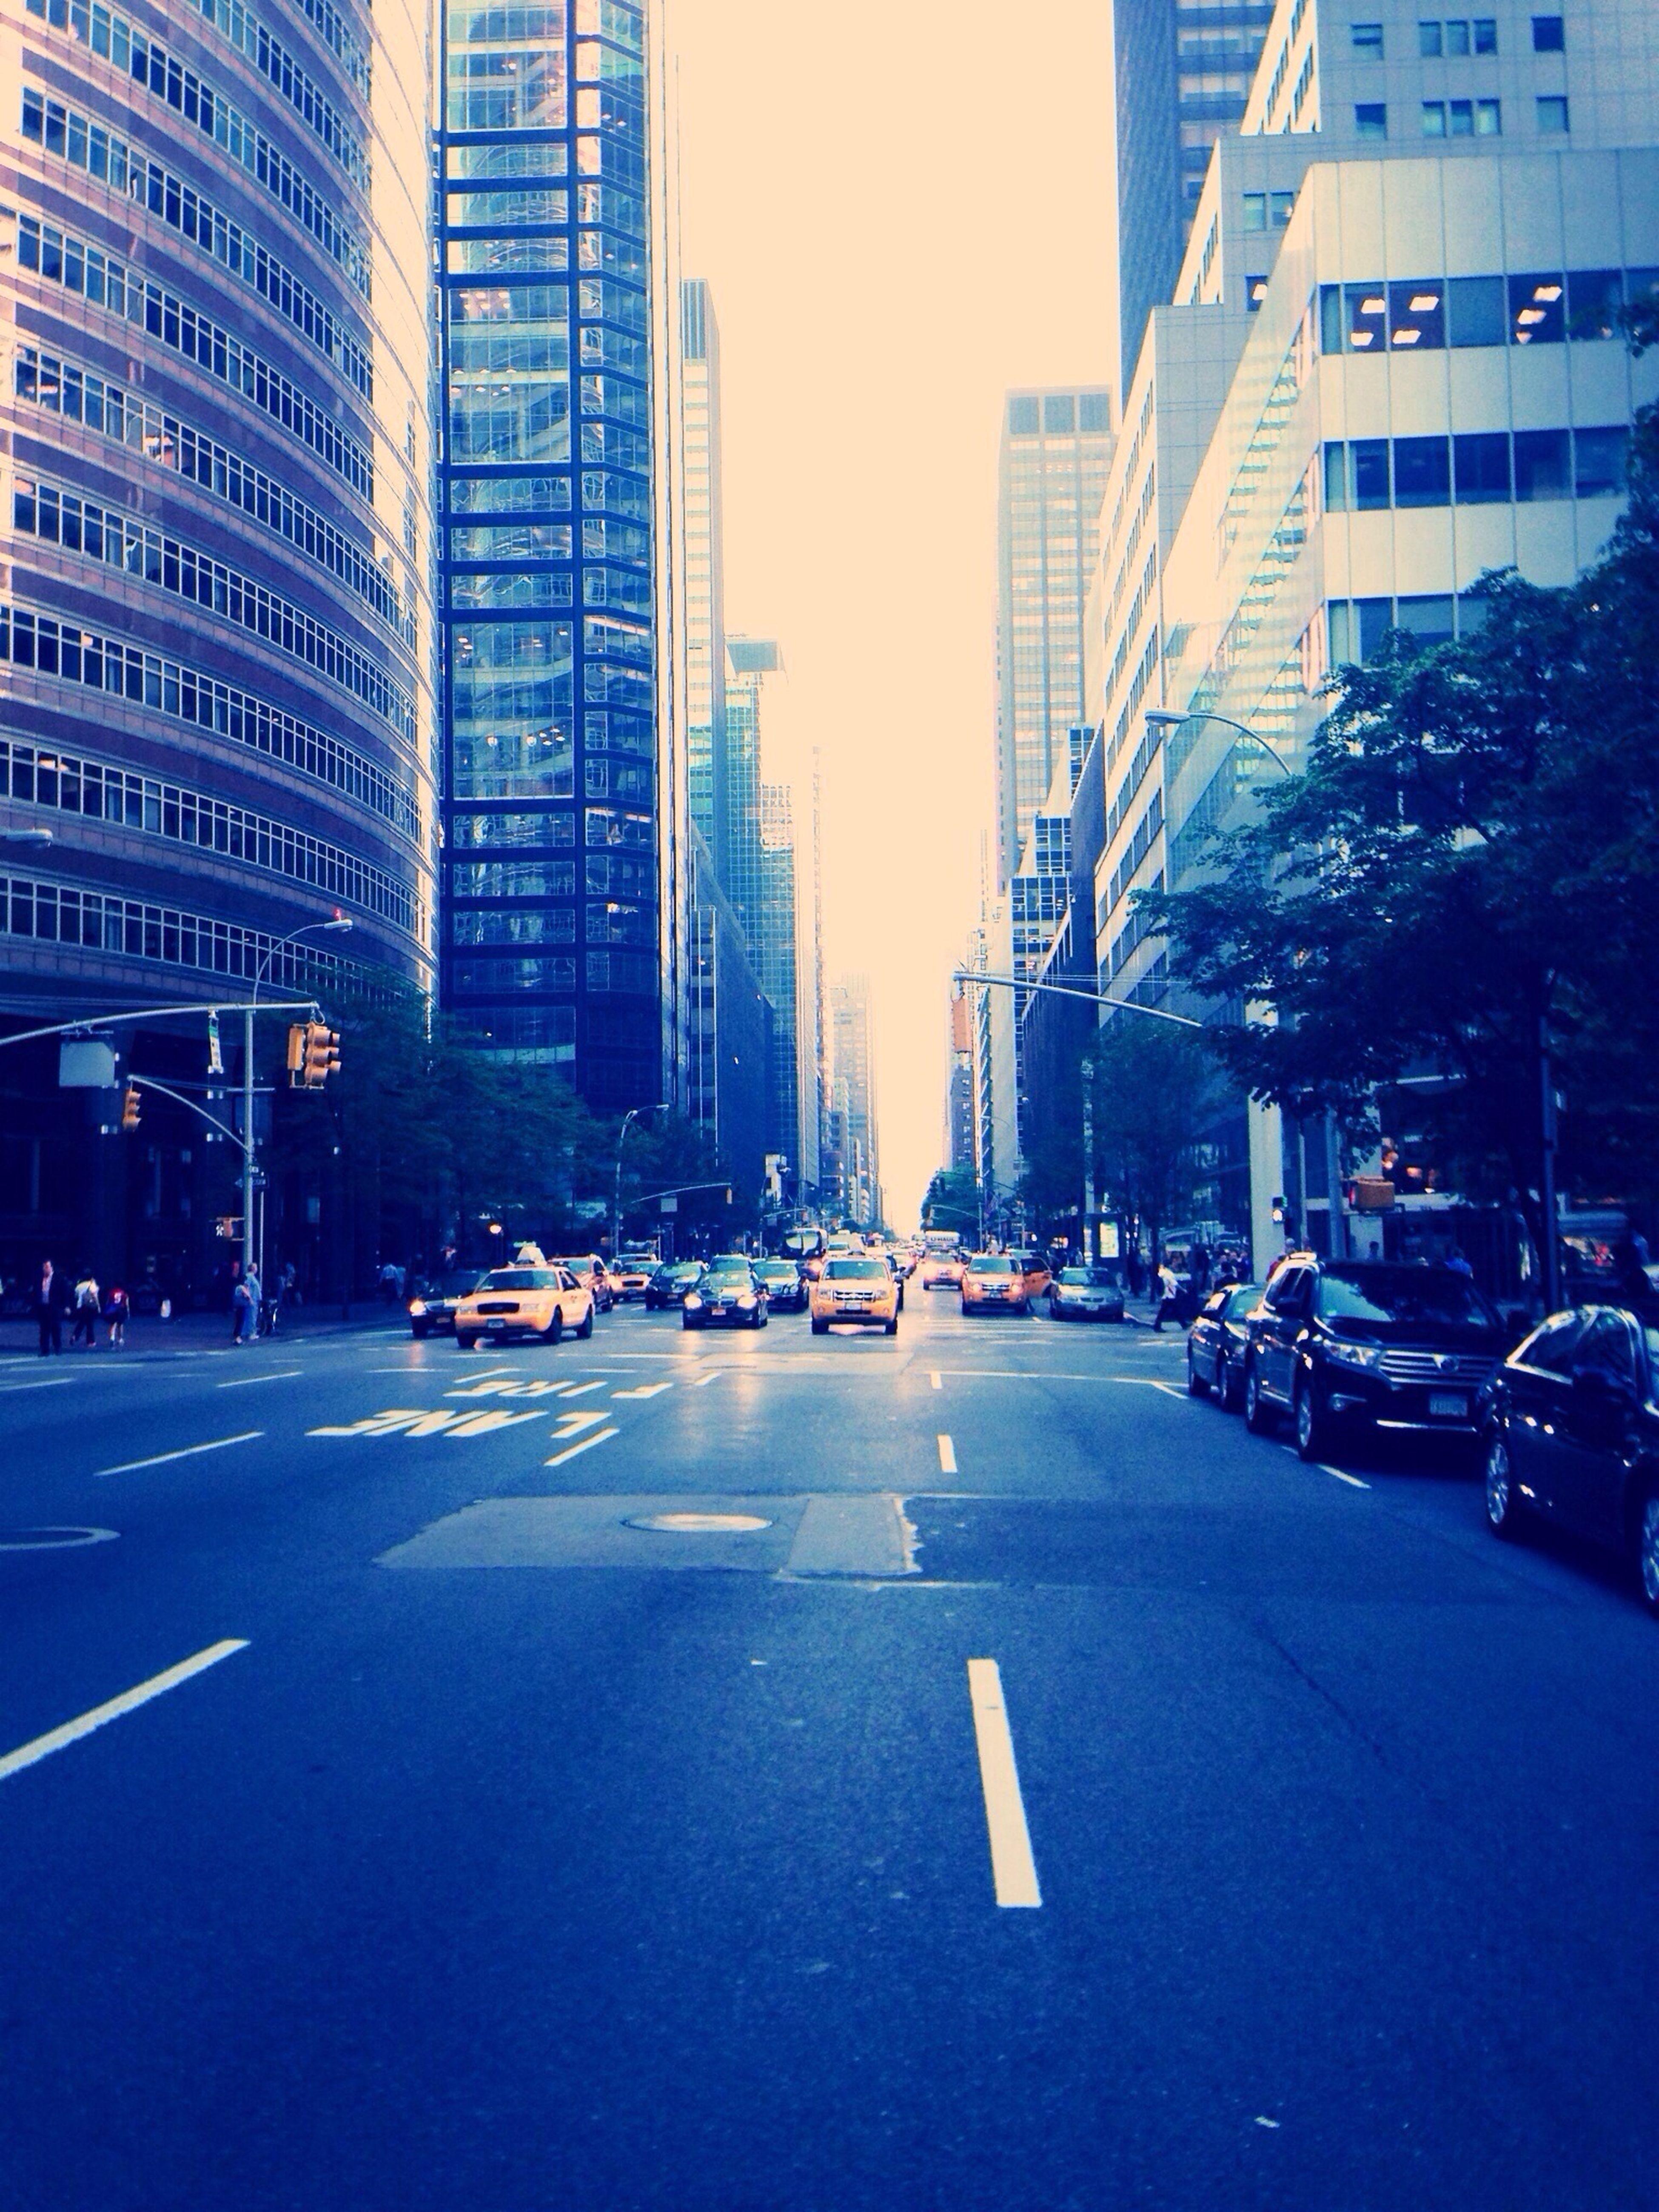 Newyork Uppereatside CityLove